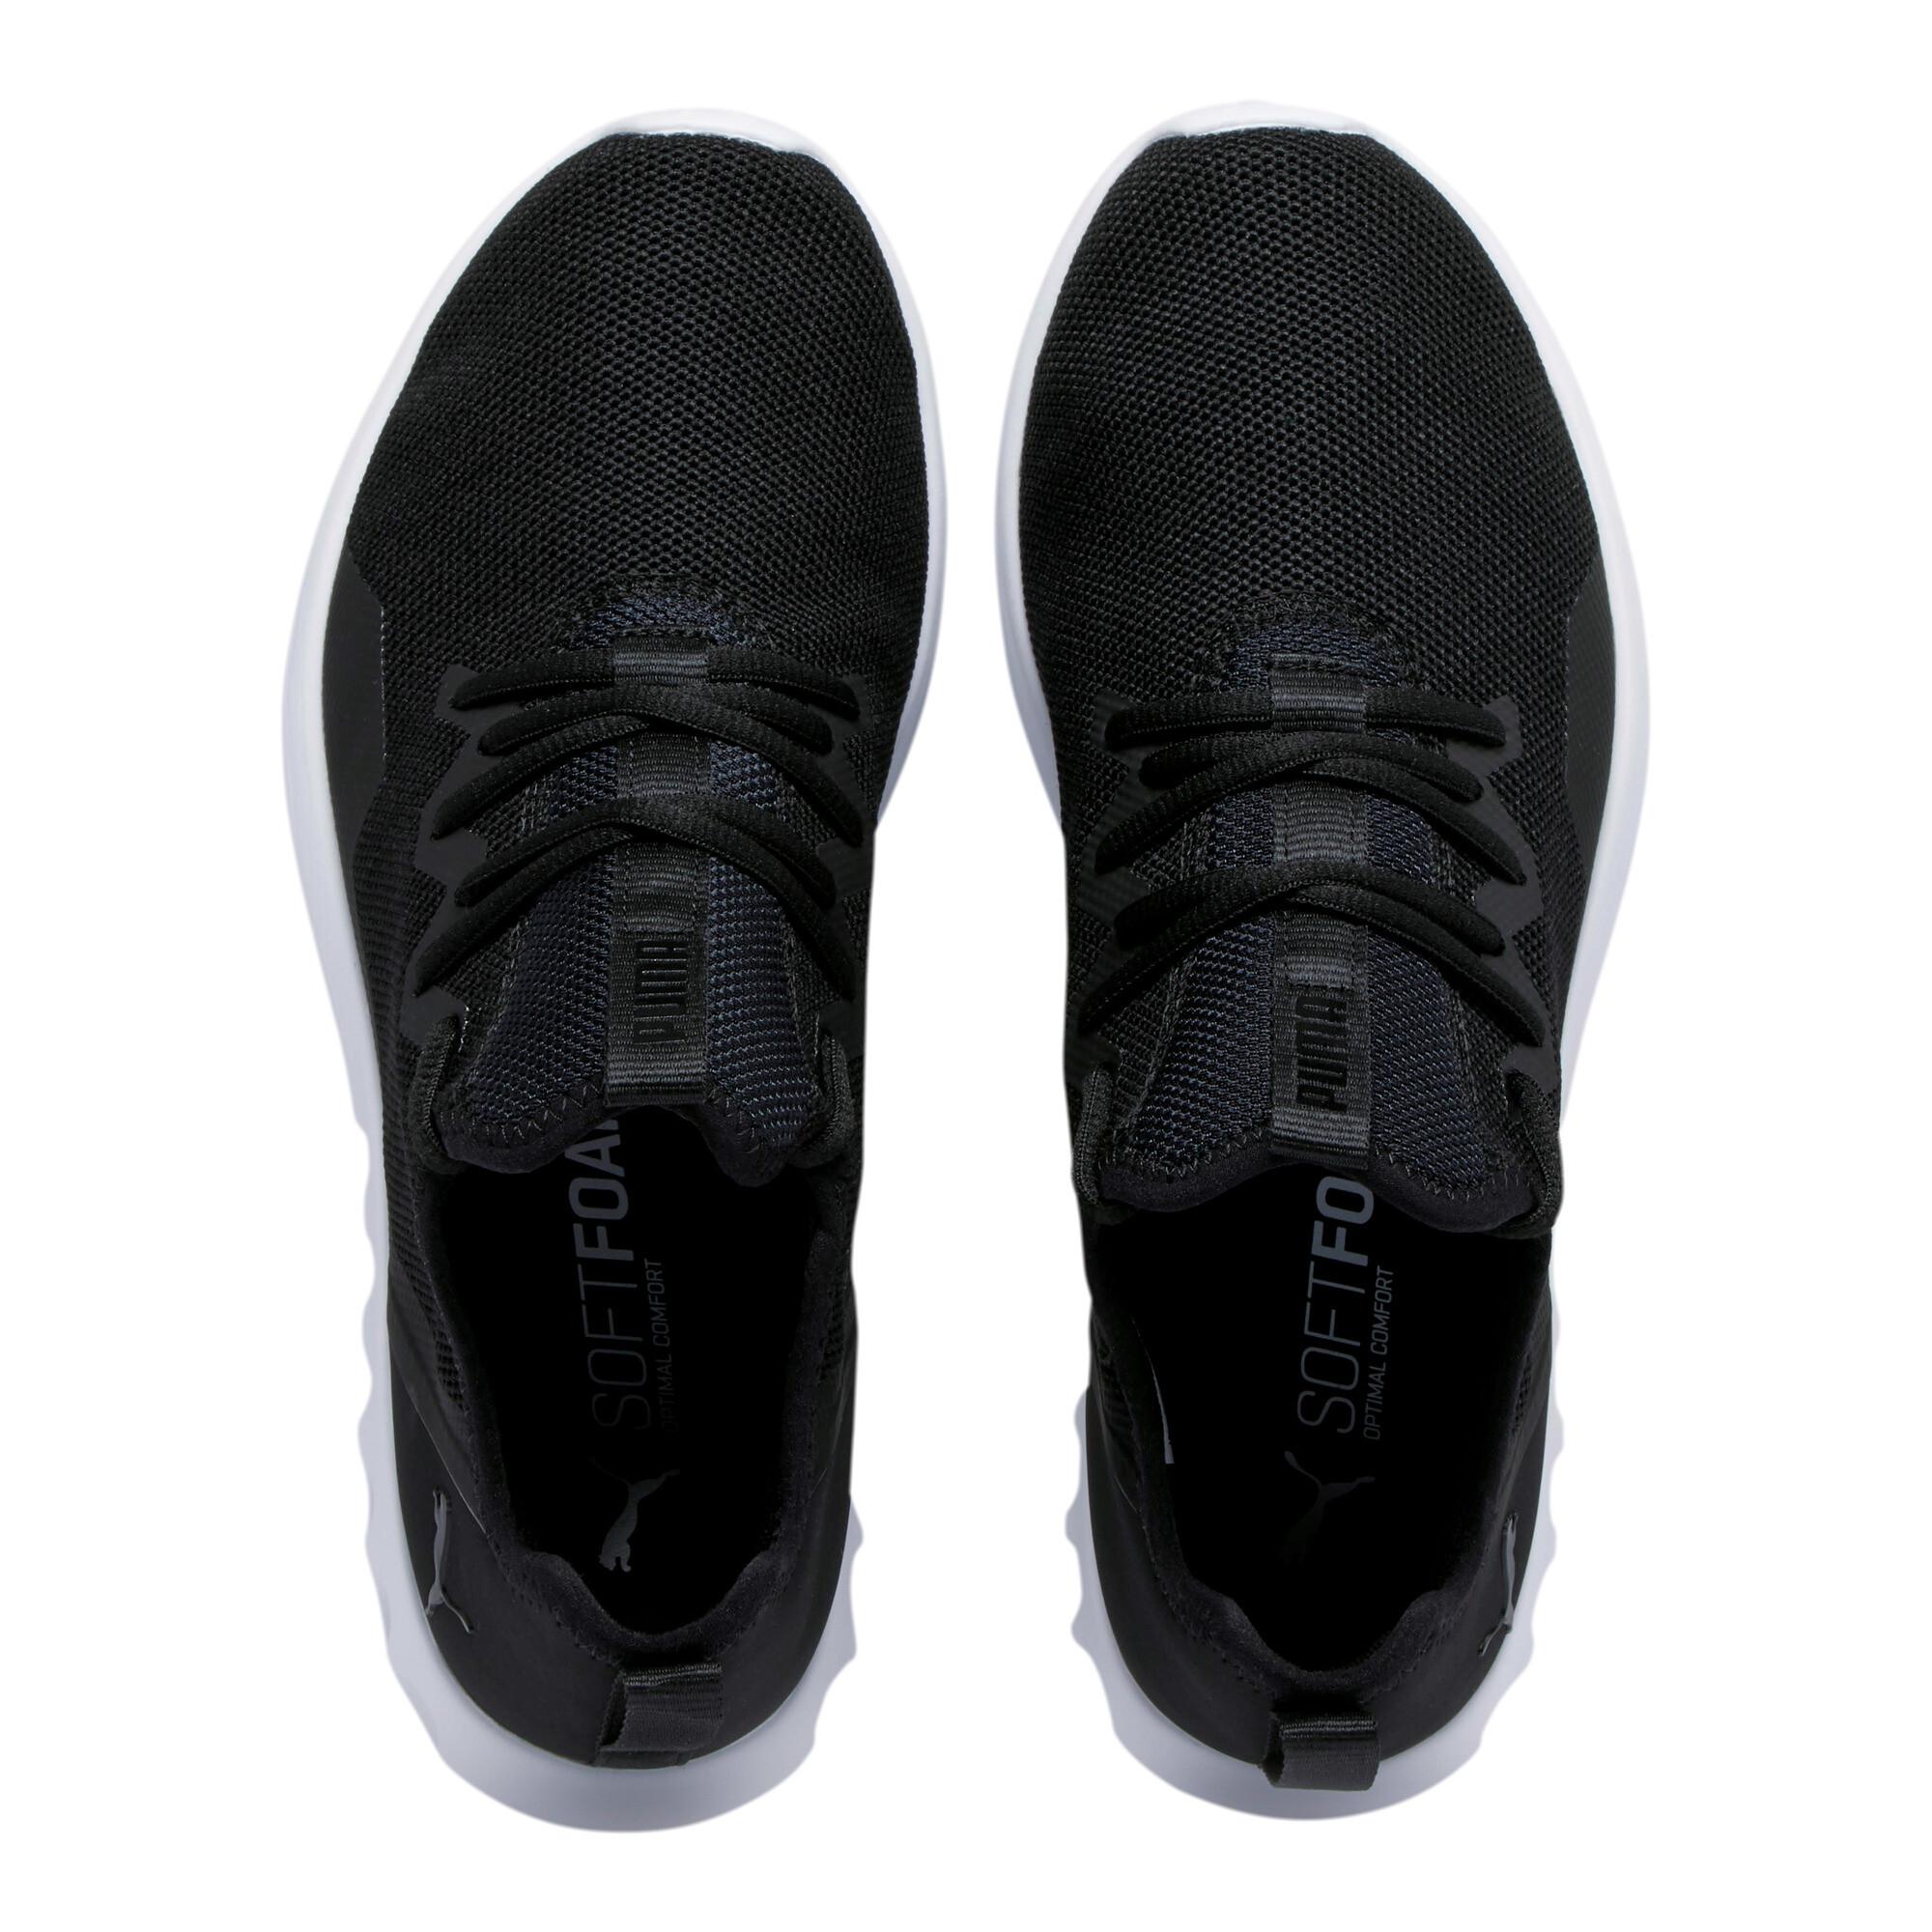 PUMA-Men-039-s-Carson-2-X-Knit-Running-Shoes thumbnail 37